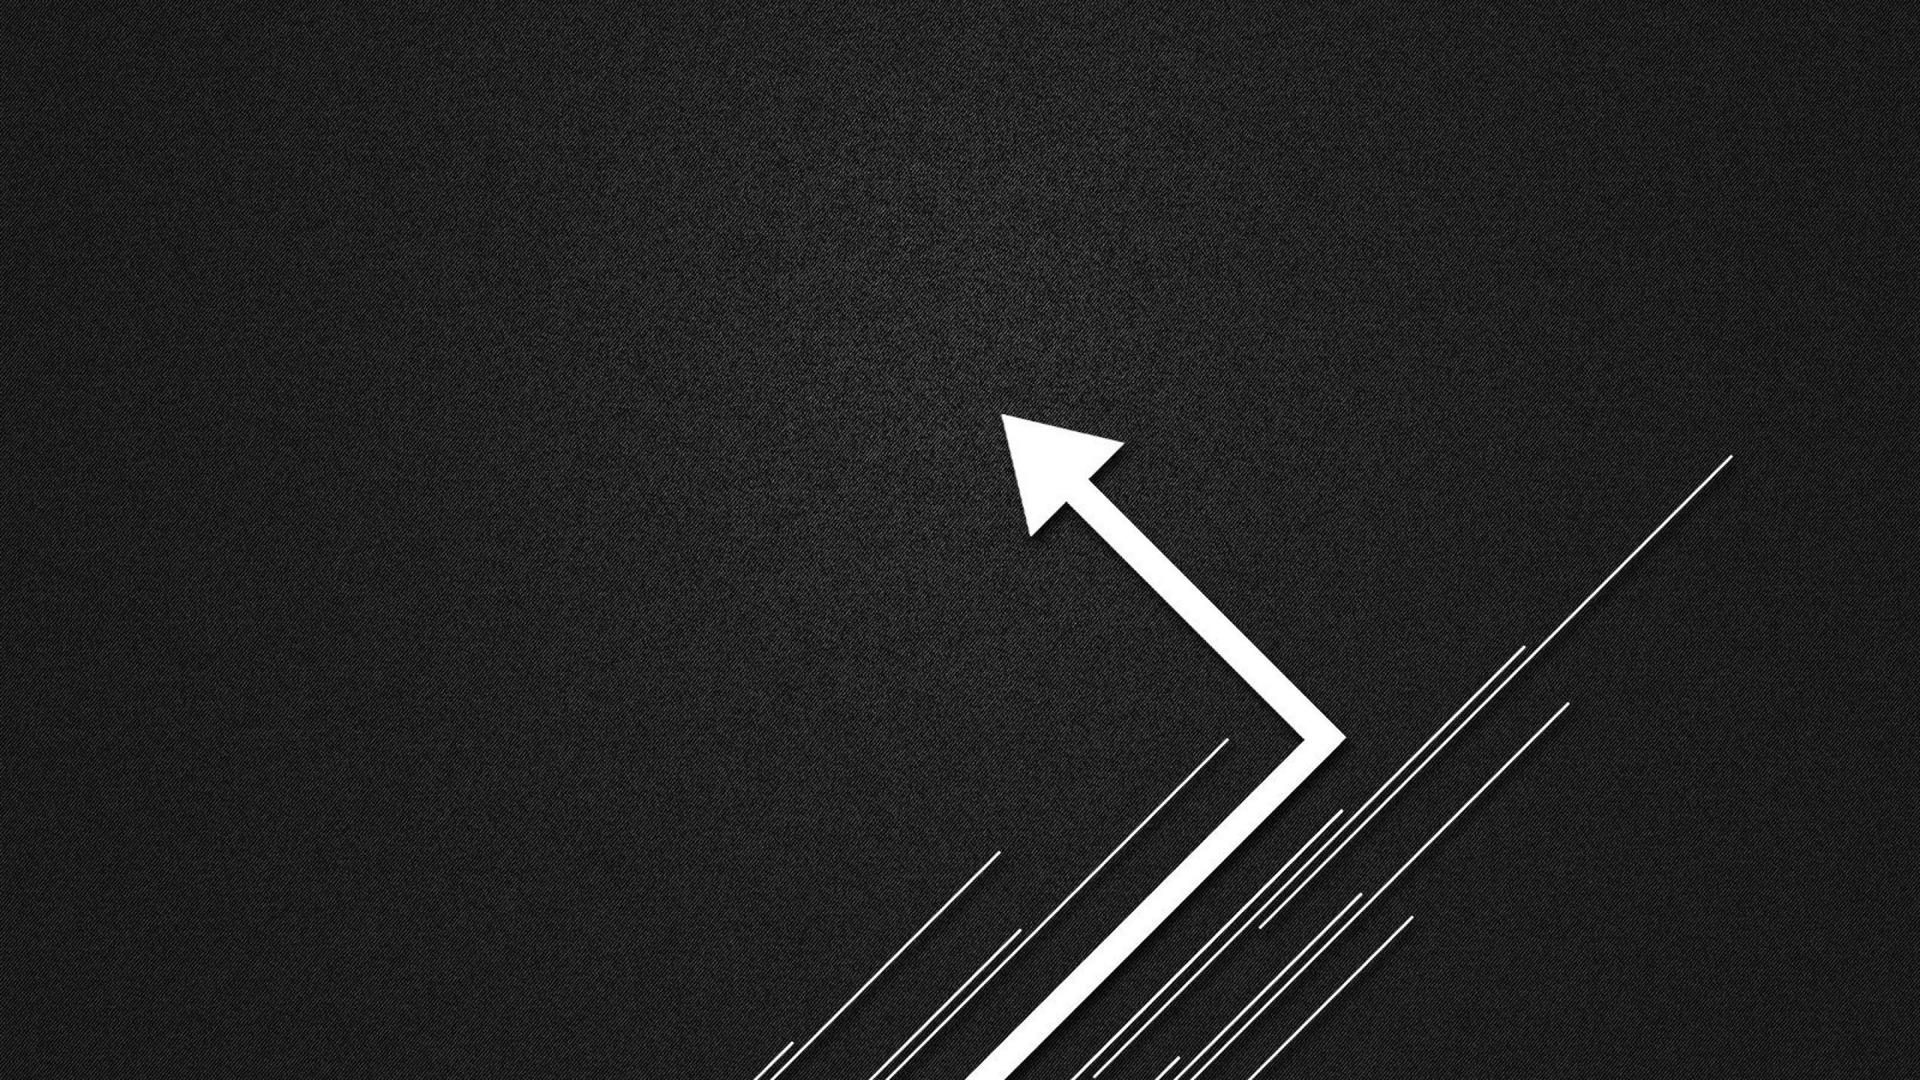 Classroom Design Arrow Or X ~ 箭头线 抽象设计壁纸预览 wallpaper